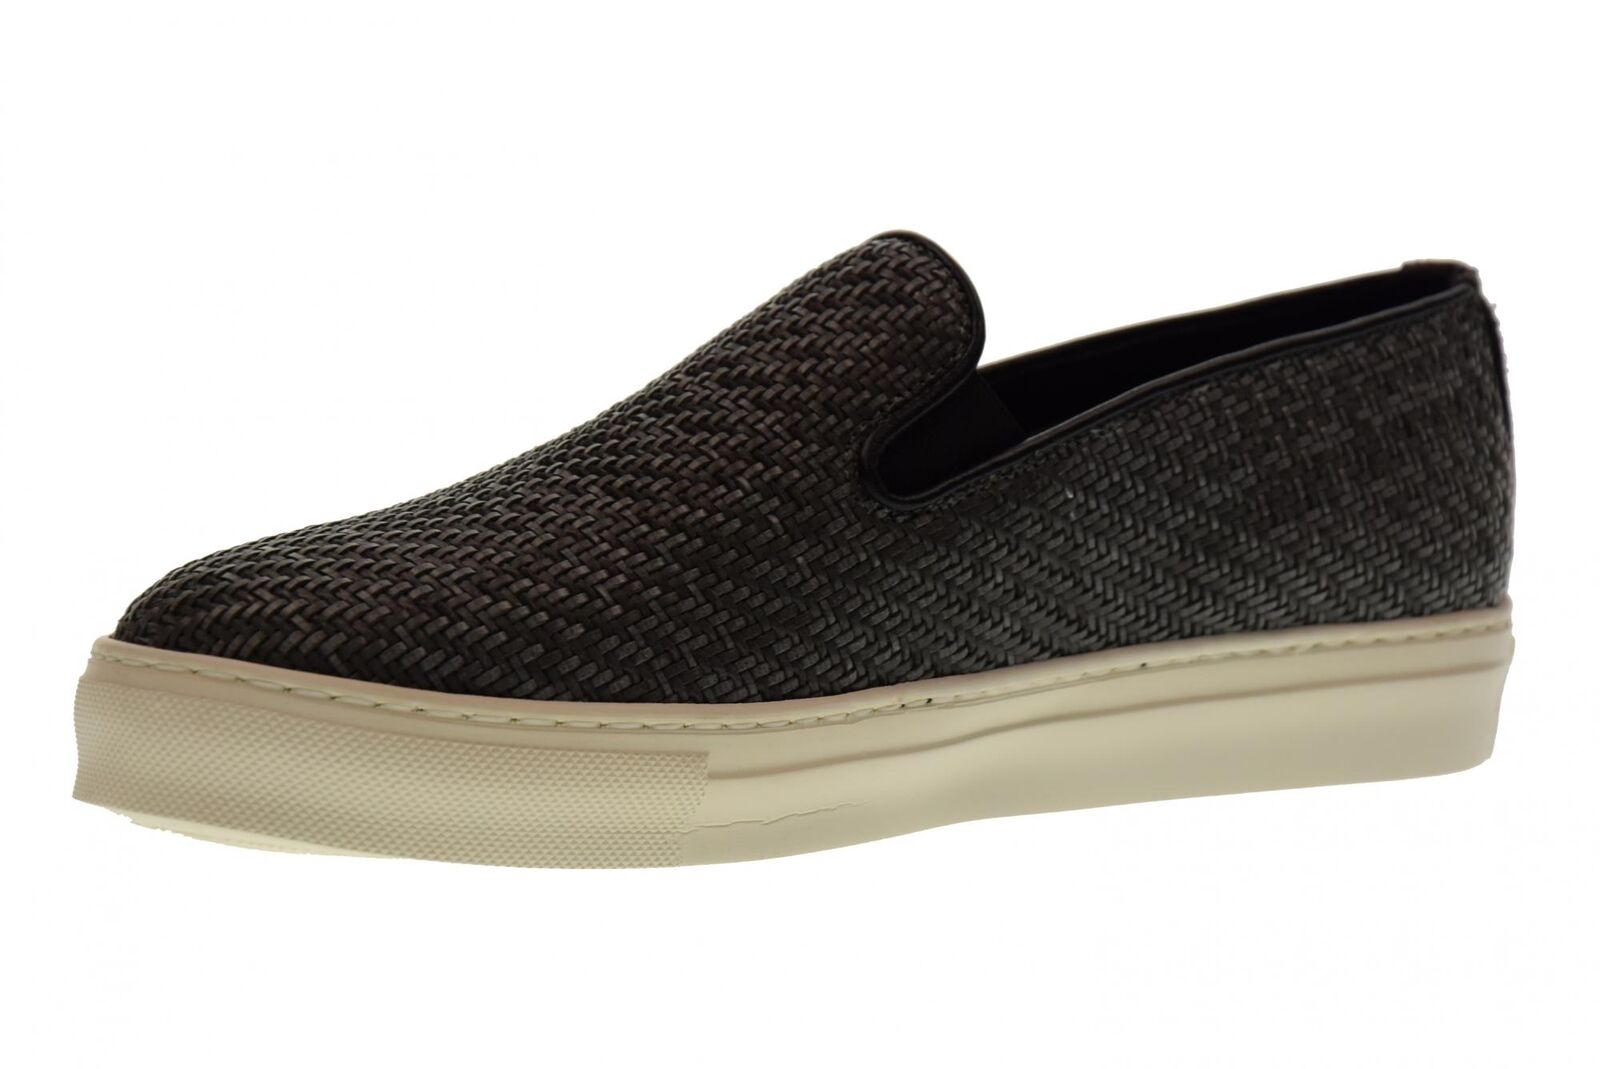 Antica Antica Antica Cuoieria scarpe uomo slip on 20123-I-V06 INTRECCIO KIRA GRIGIO P18   Stile elegante  b7d63a